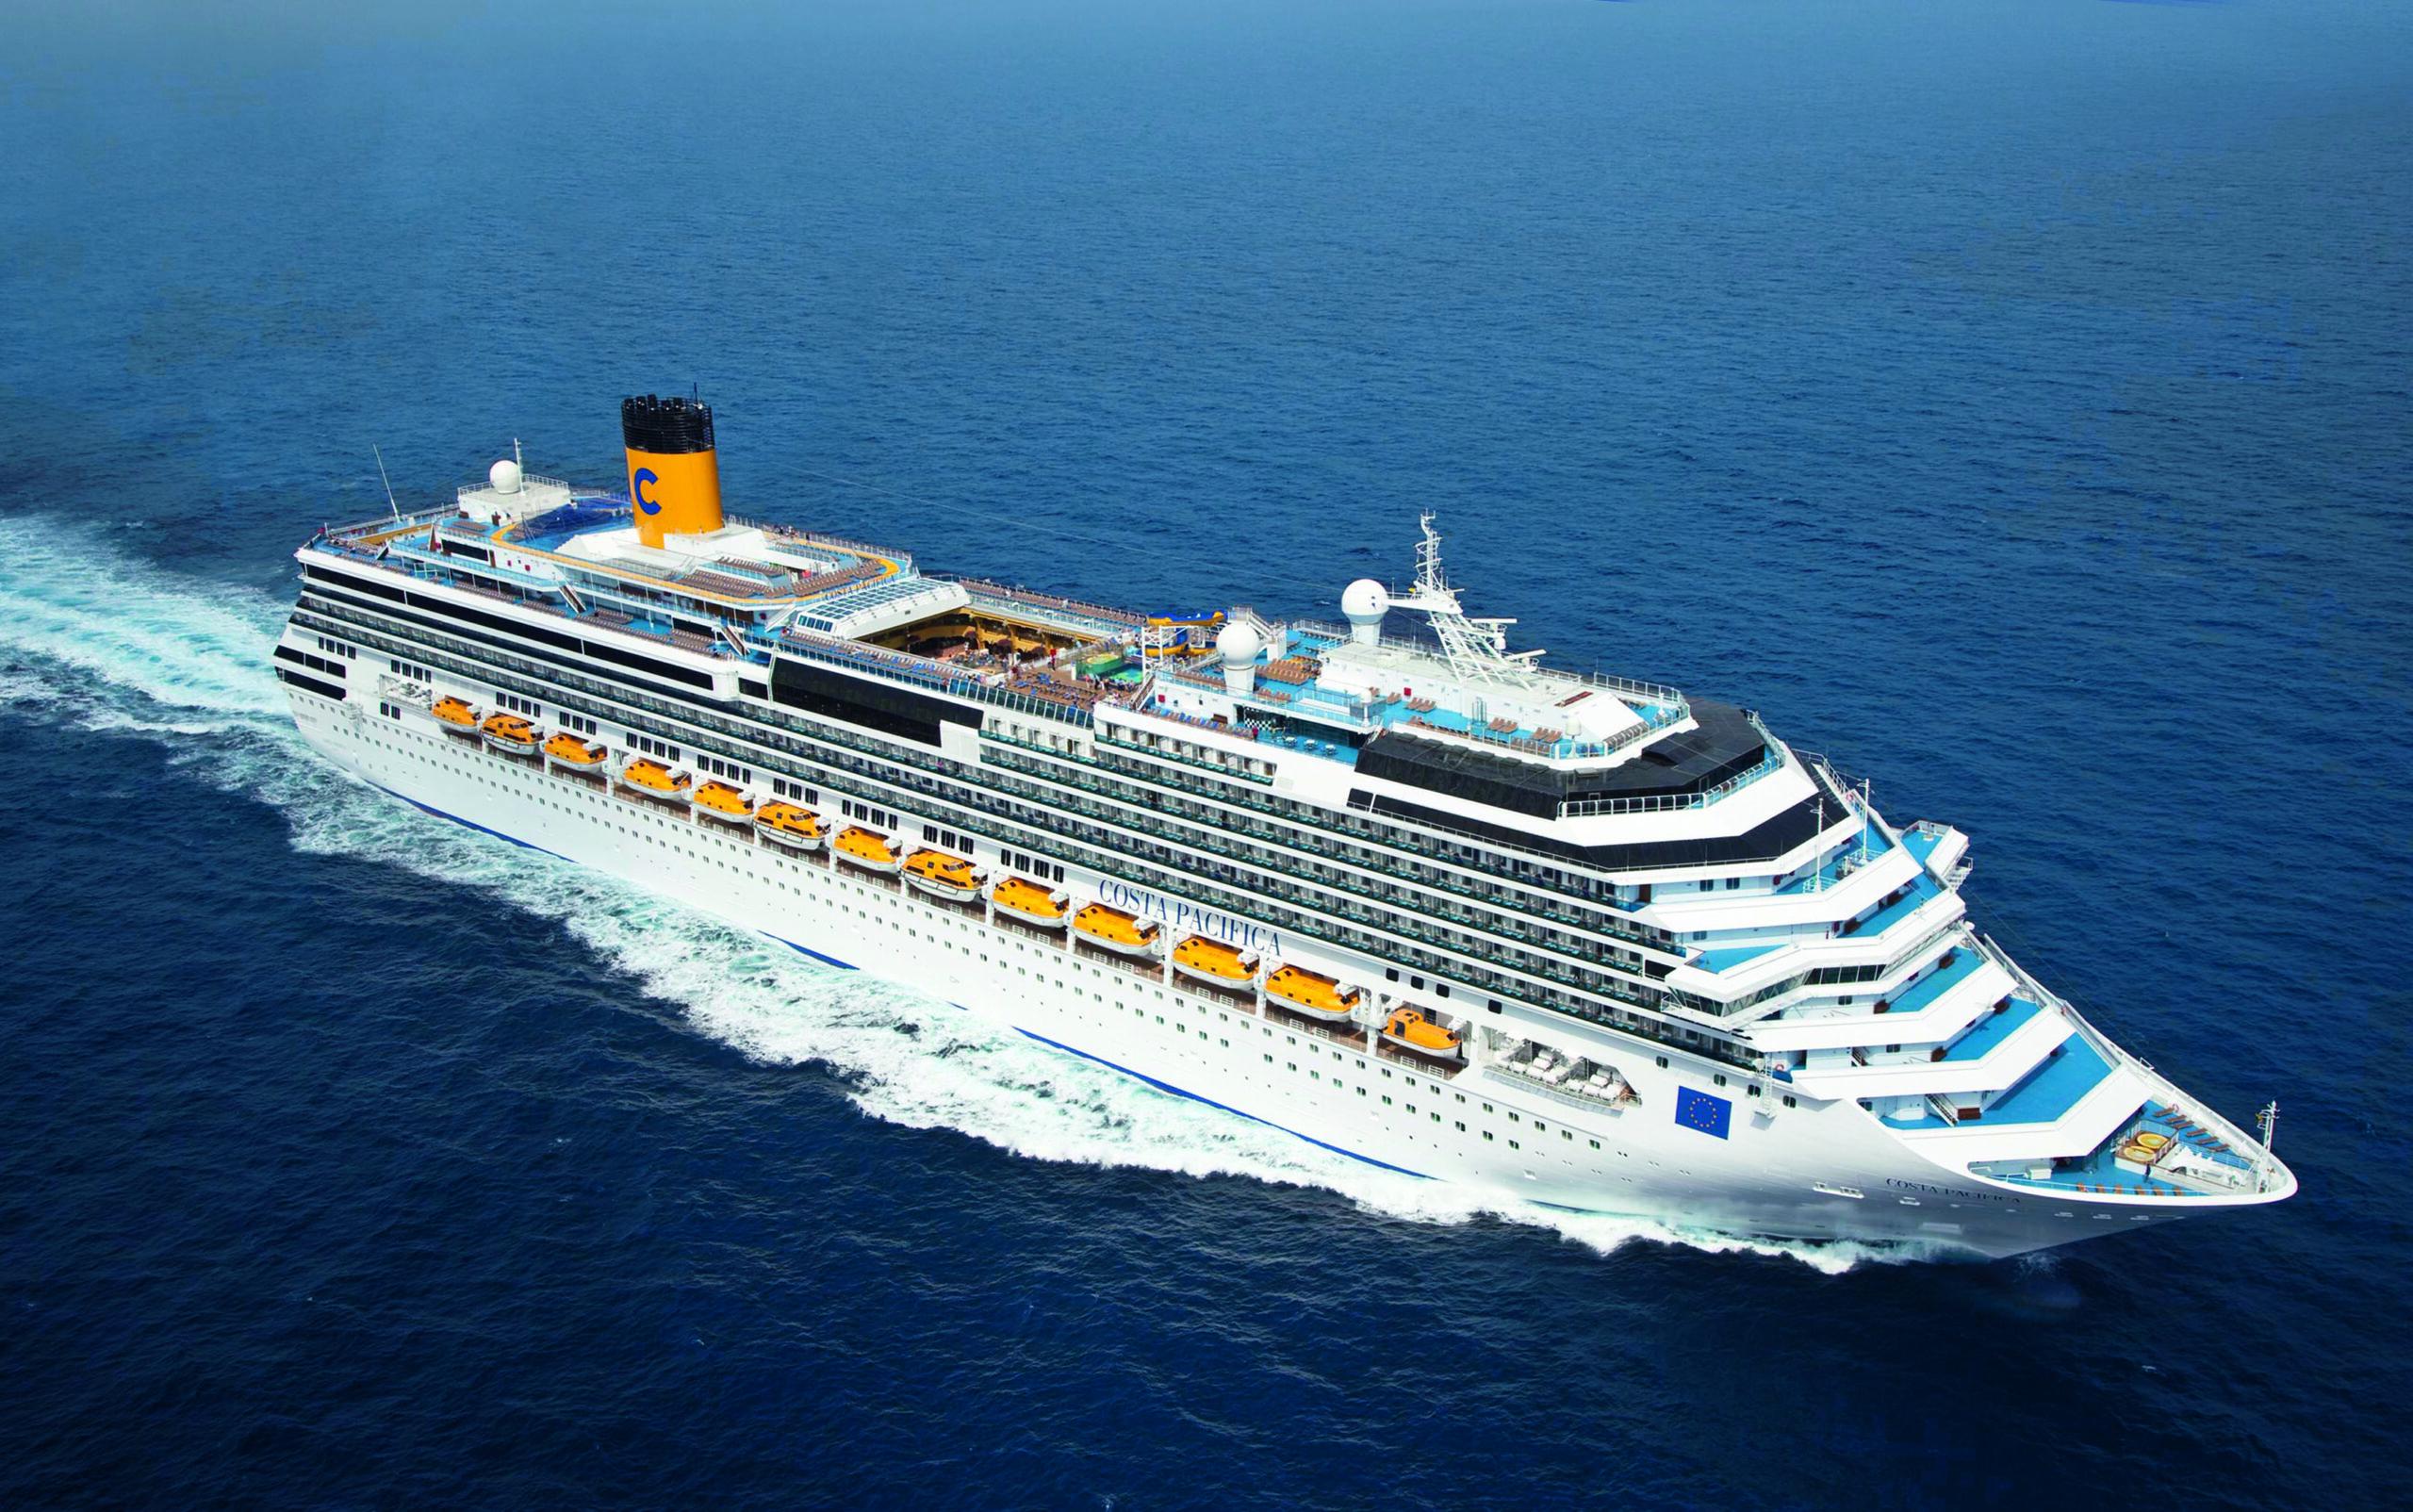 Cruiseschip-Costa Pacifica-Costa Cruises-Schip